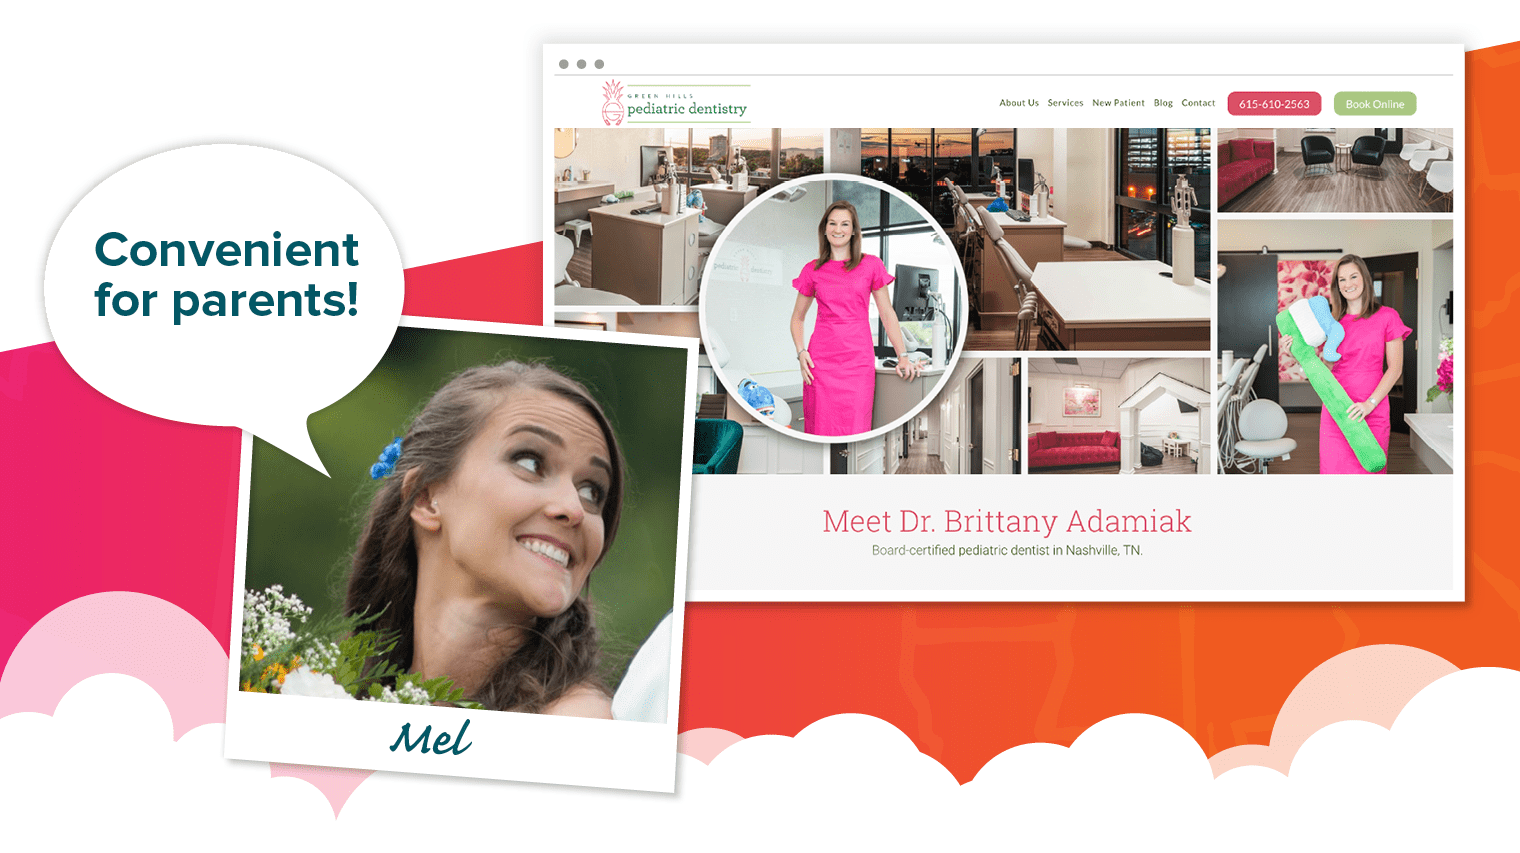 Mel's choice - Green Hills Pediatric Dentistry